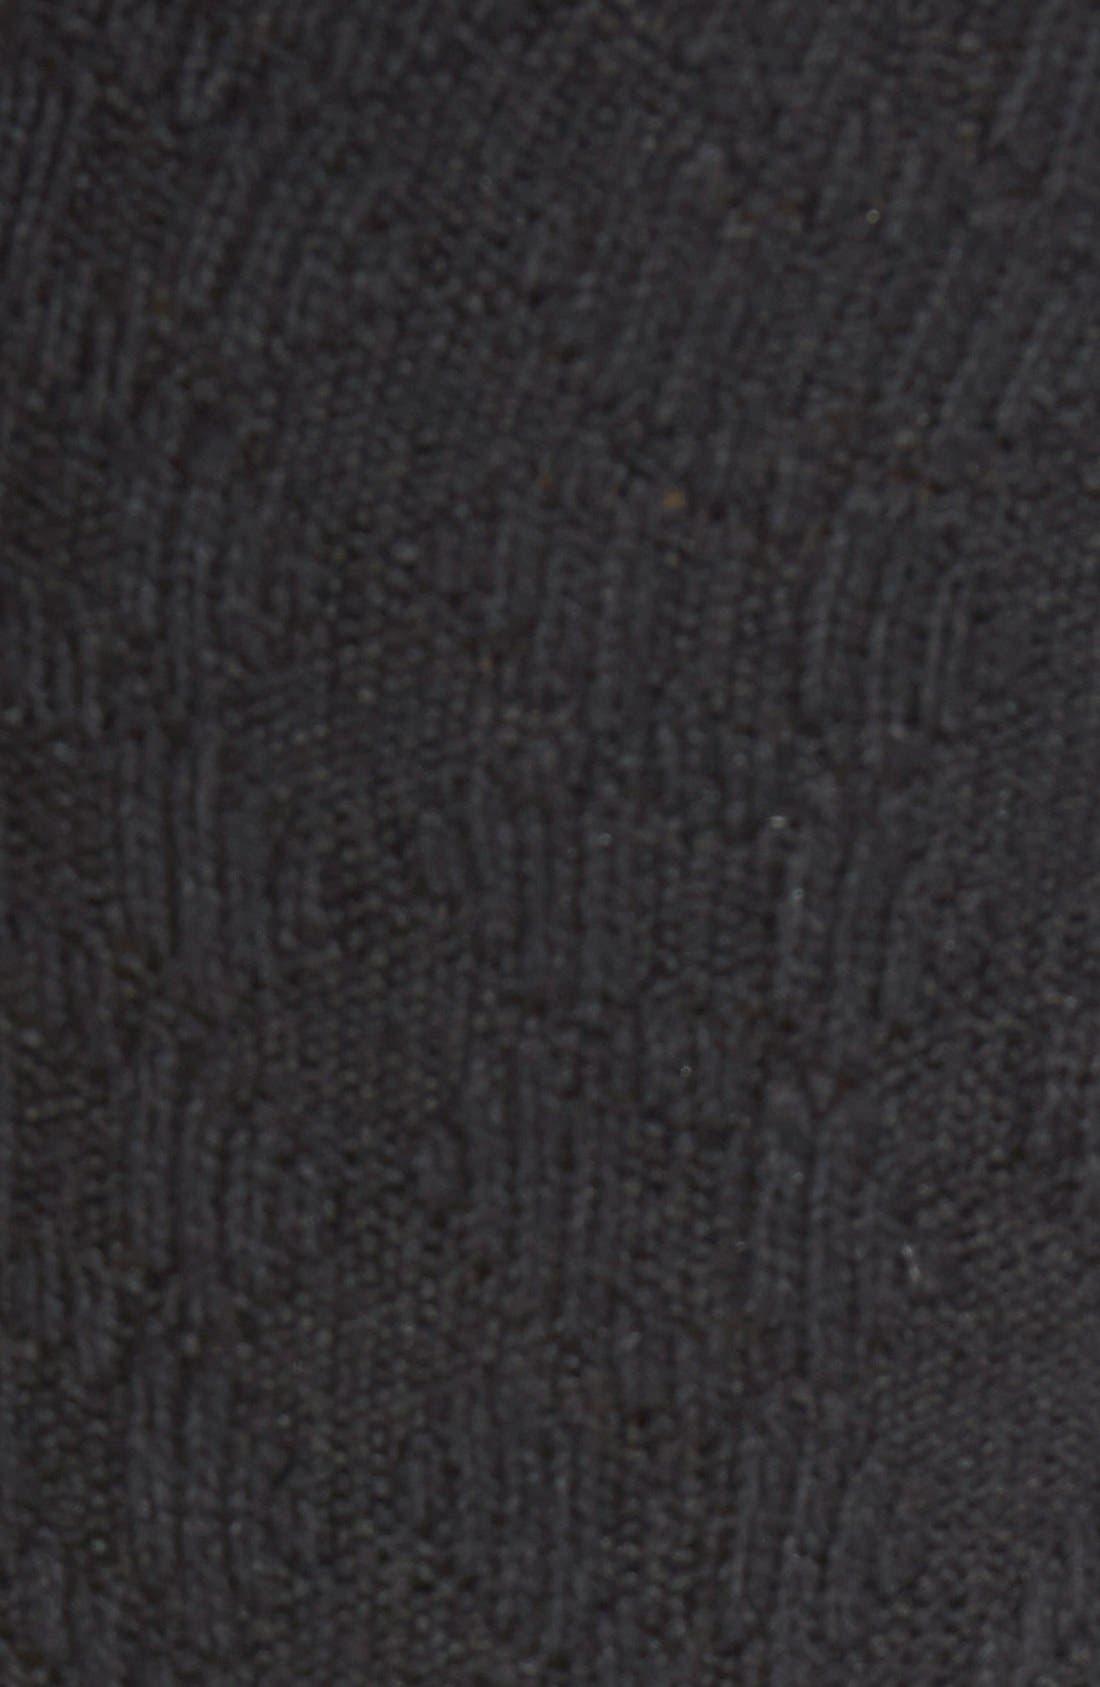 Alternate Image 2  - Hue 'Fisherman' Cable Knit Knee High Socks